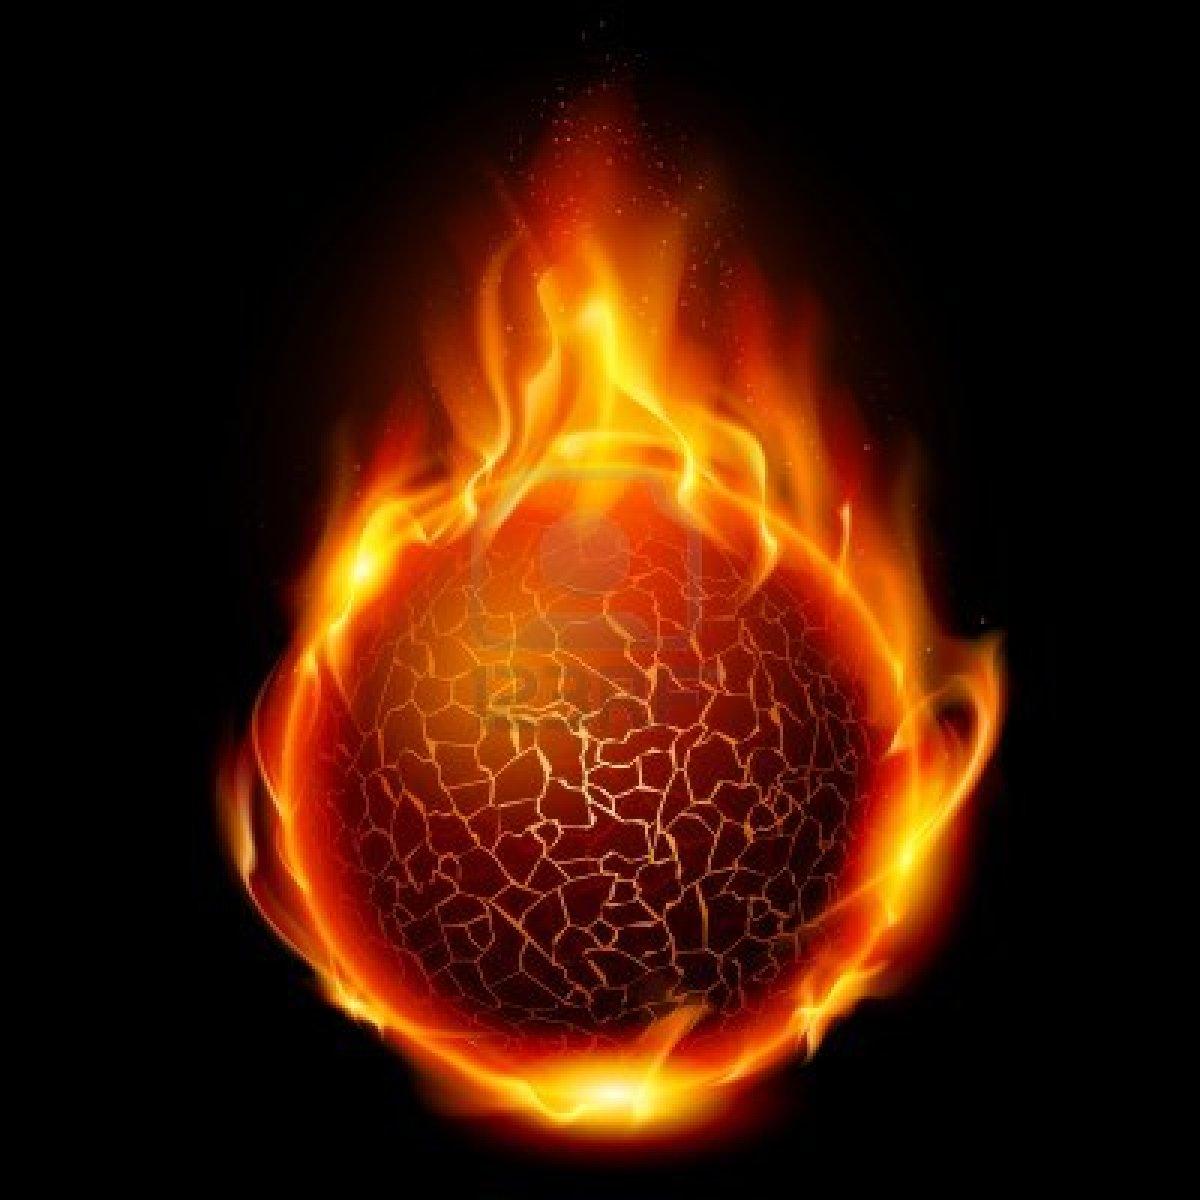 fireball blank template imgflip